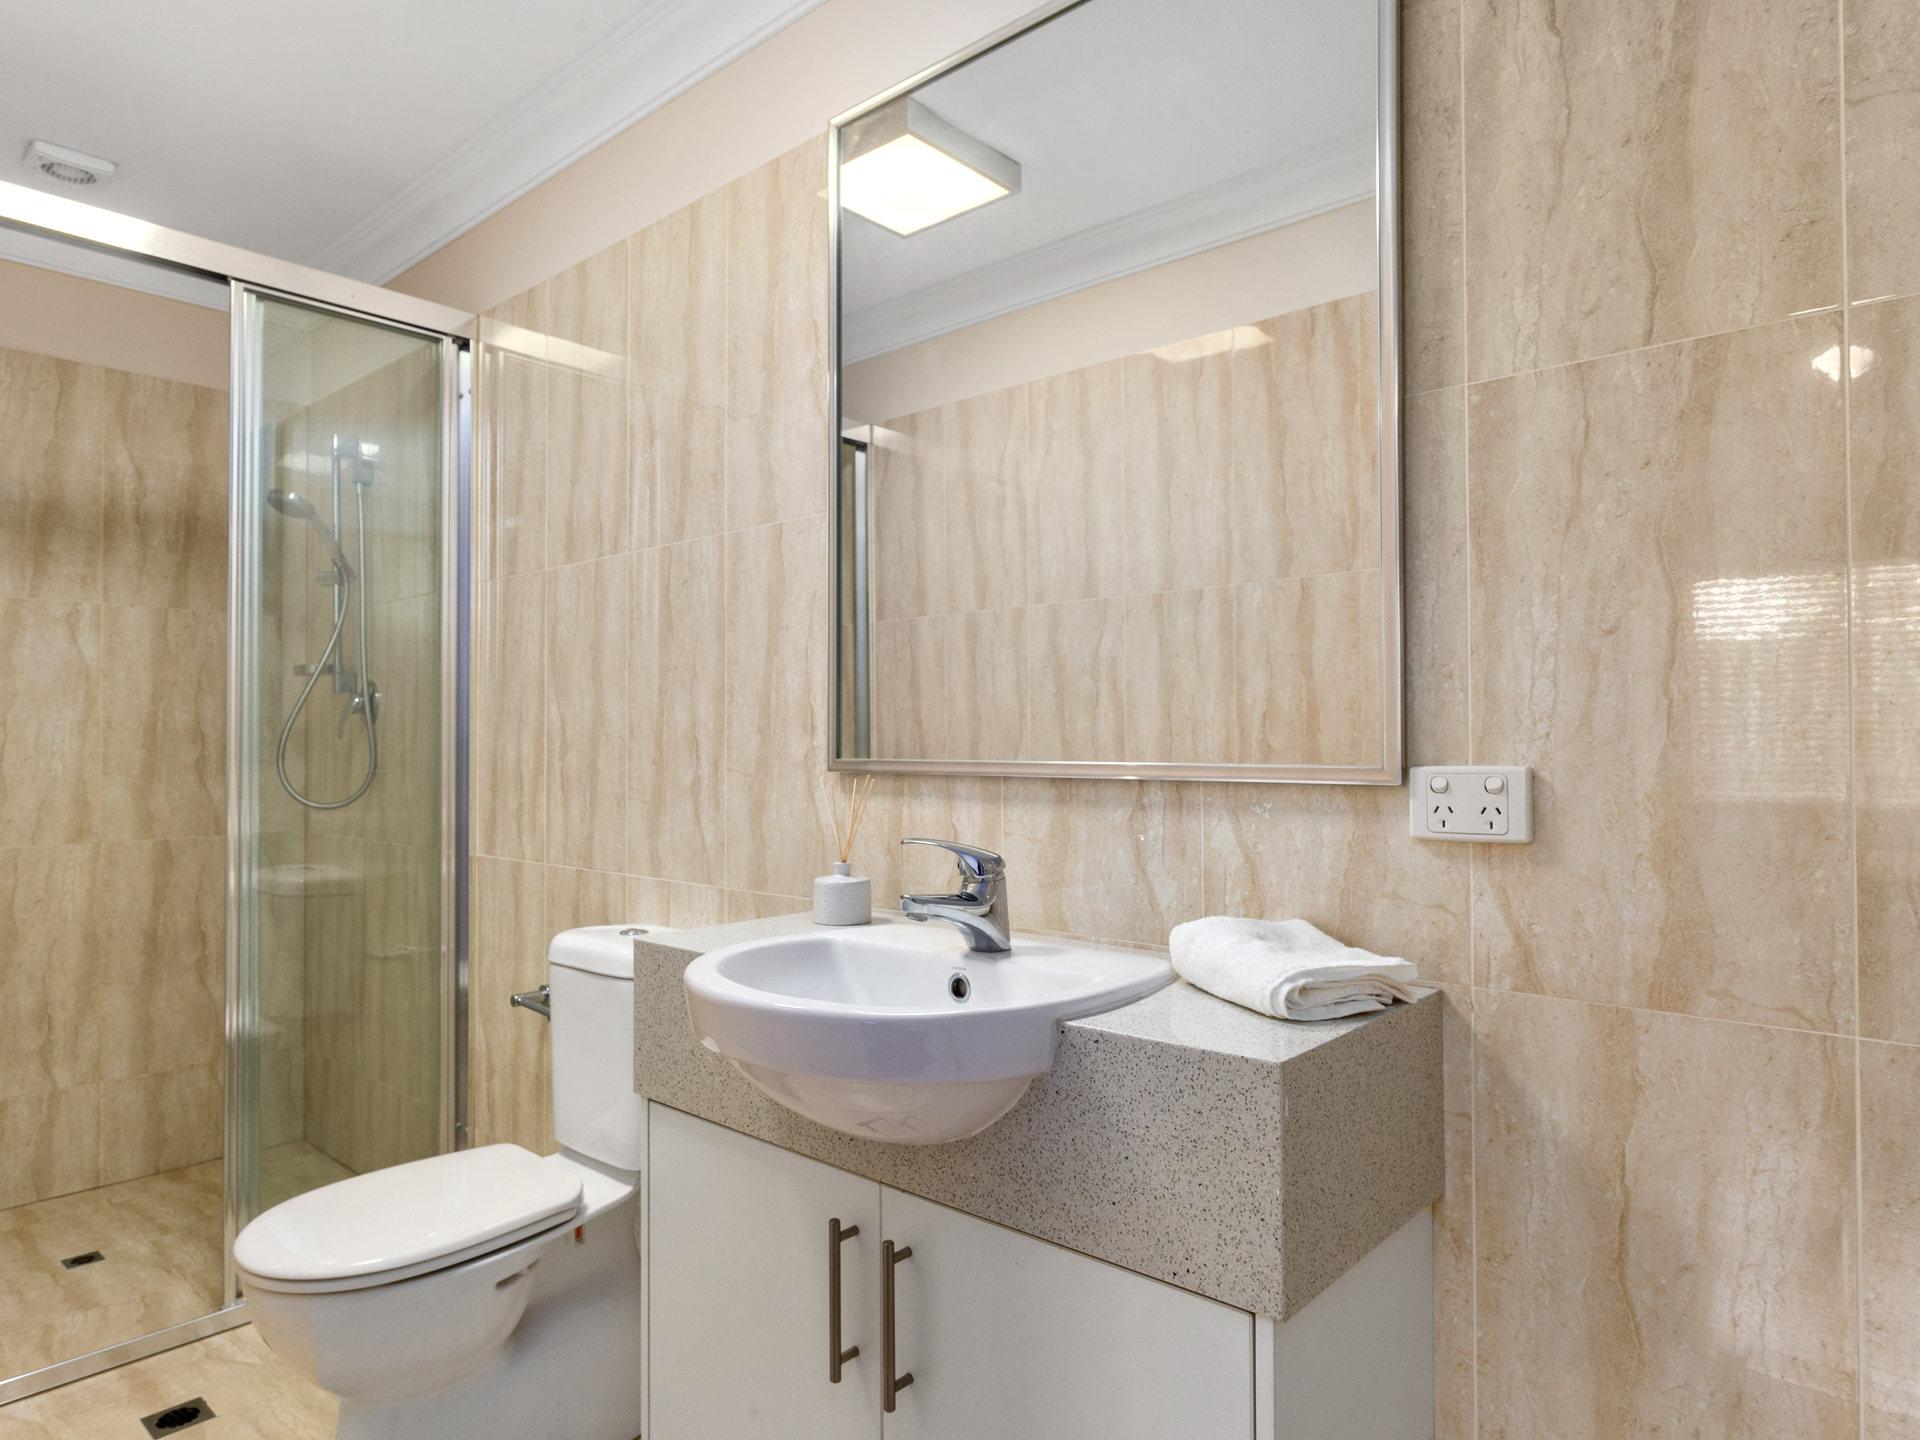 Room 1 Forrest St Bathroom